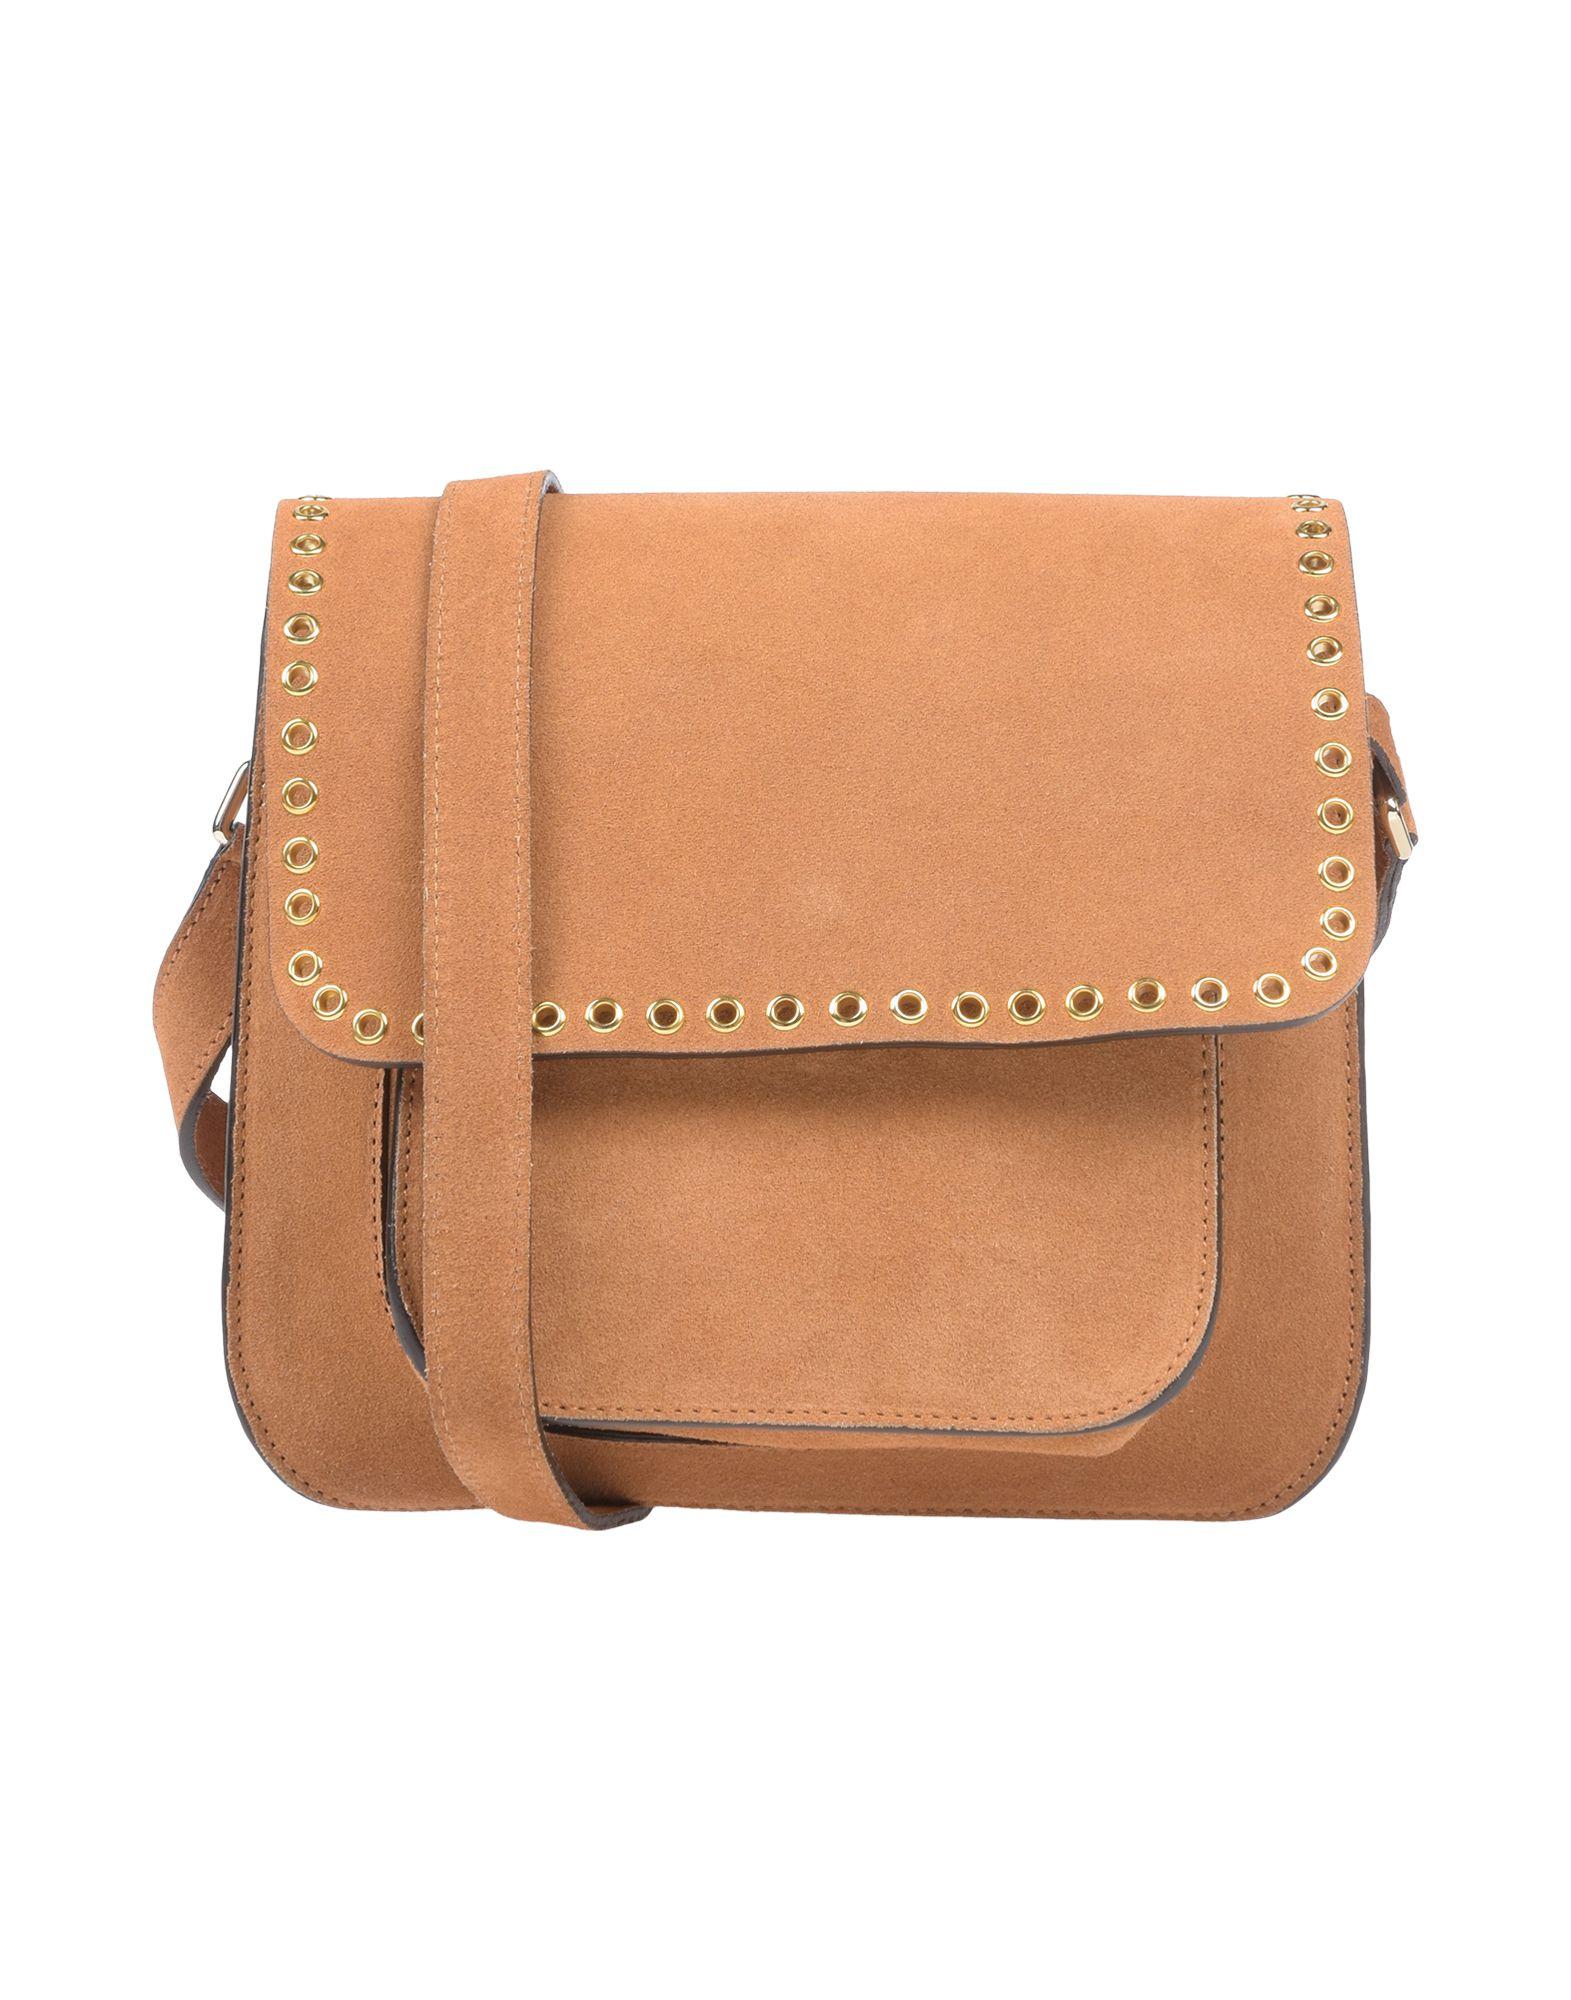 Etoile Isabel Marant Bags HANDBAGS